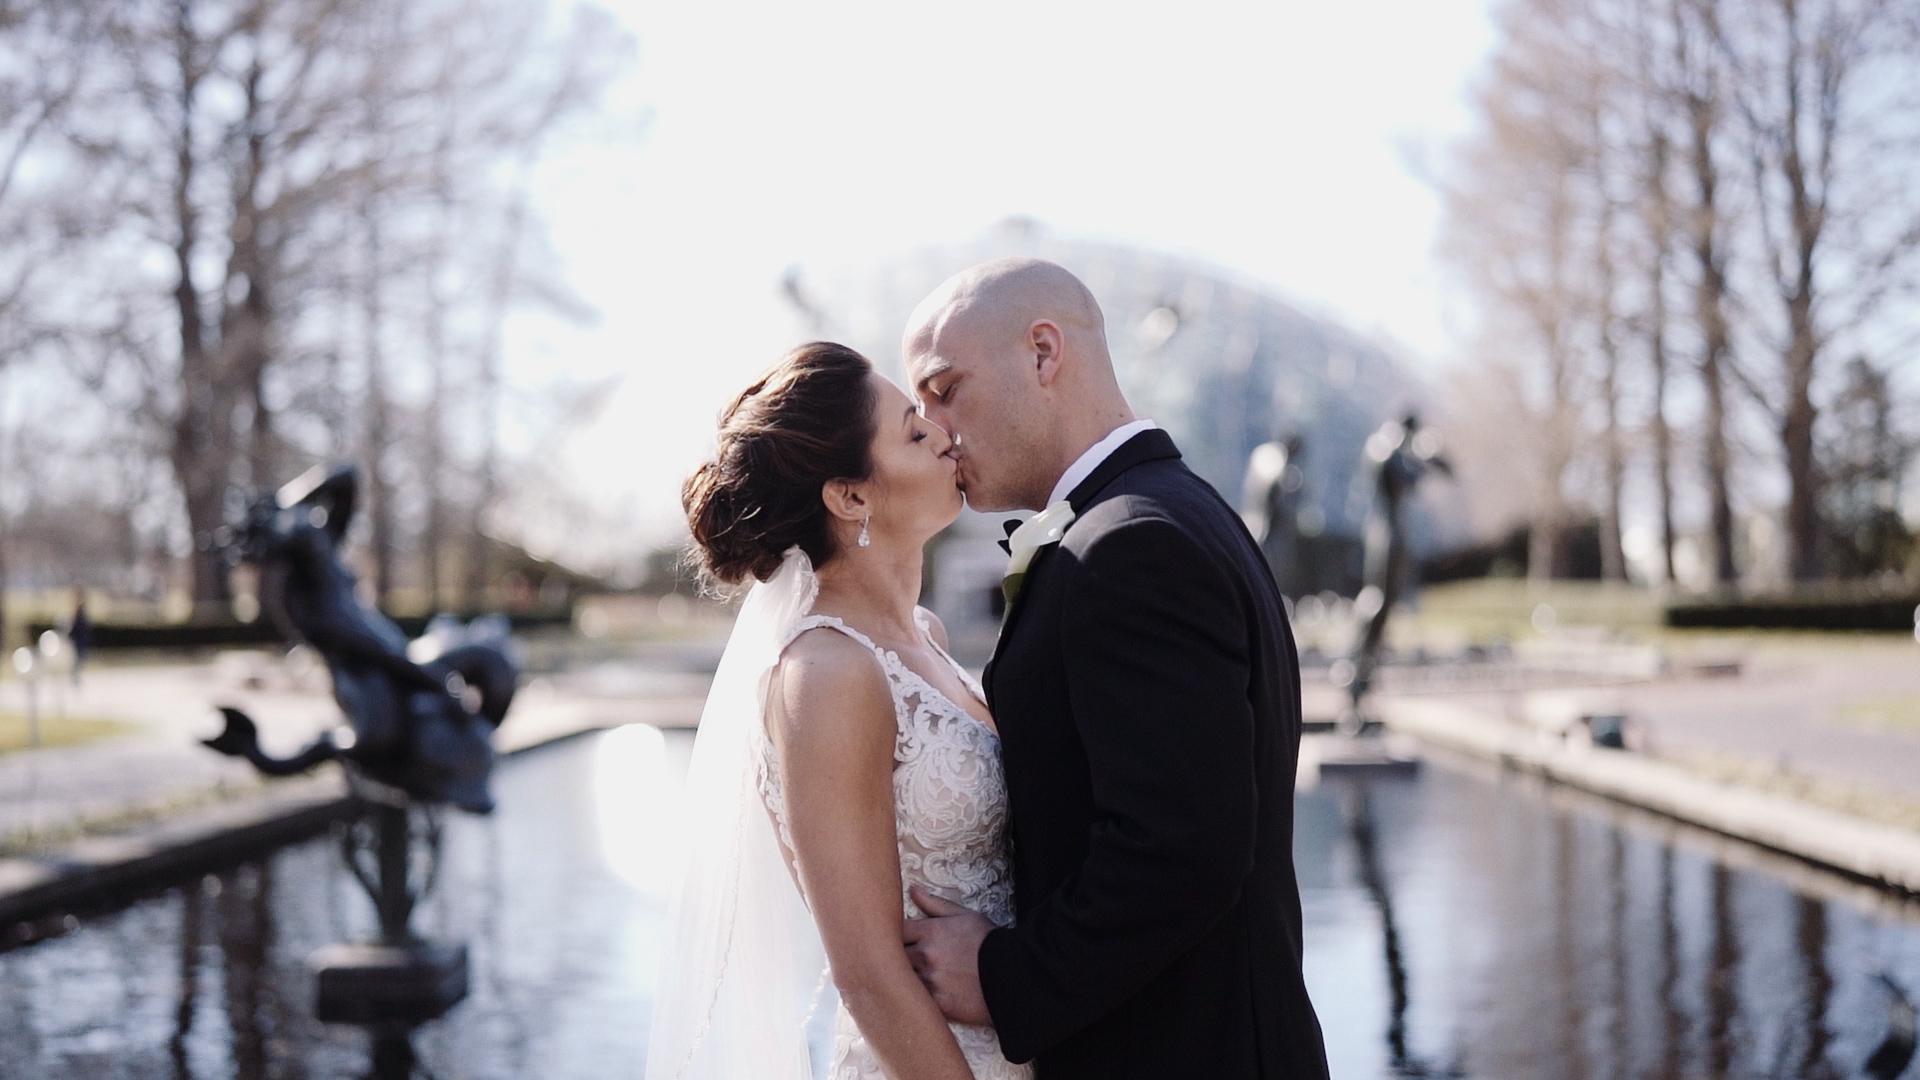 Wedding Kiss at Missouri Botanical Gardens / wedding video